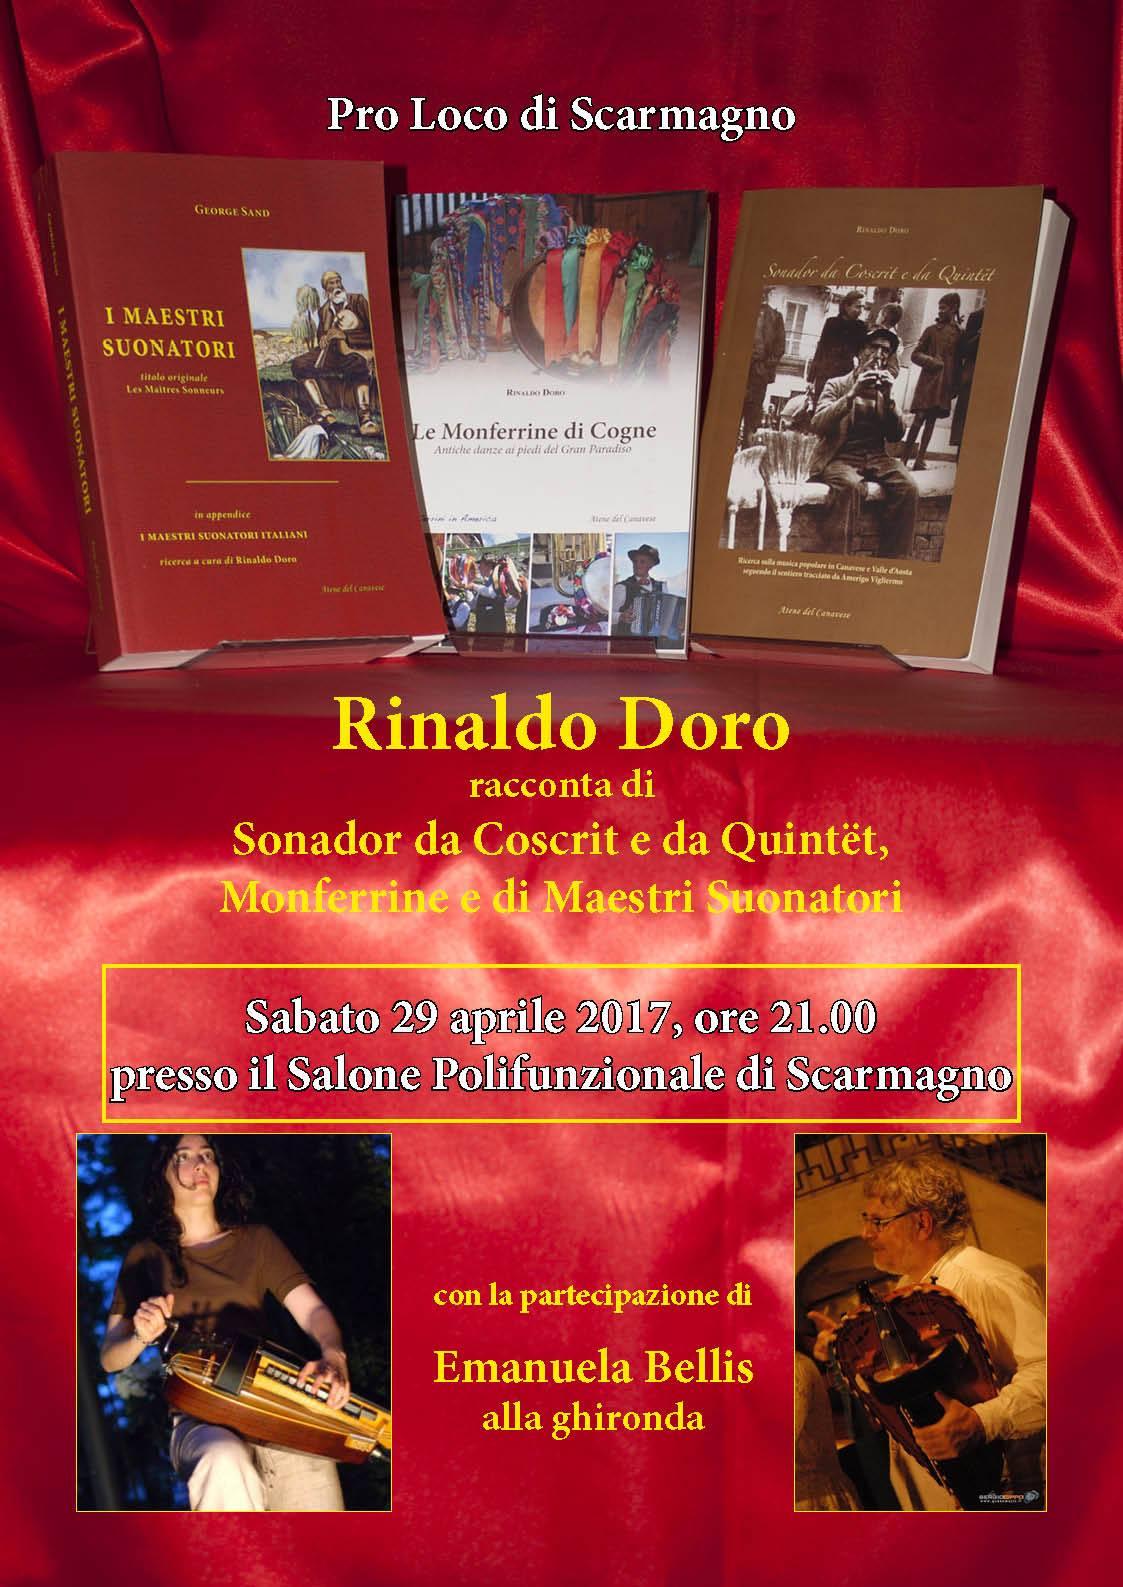 Sonador da Coscrit Rinaldo Doro 29 4 2017